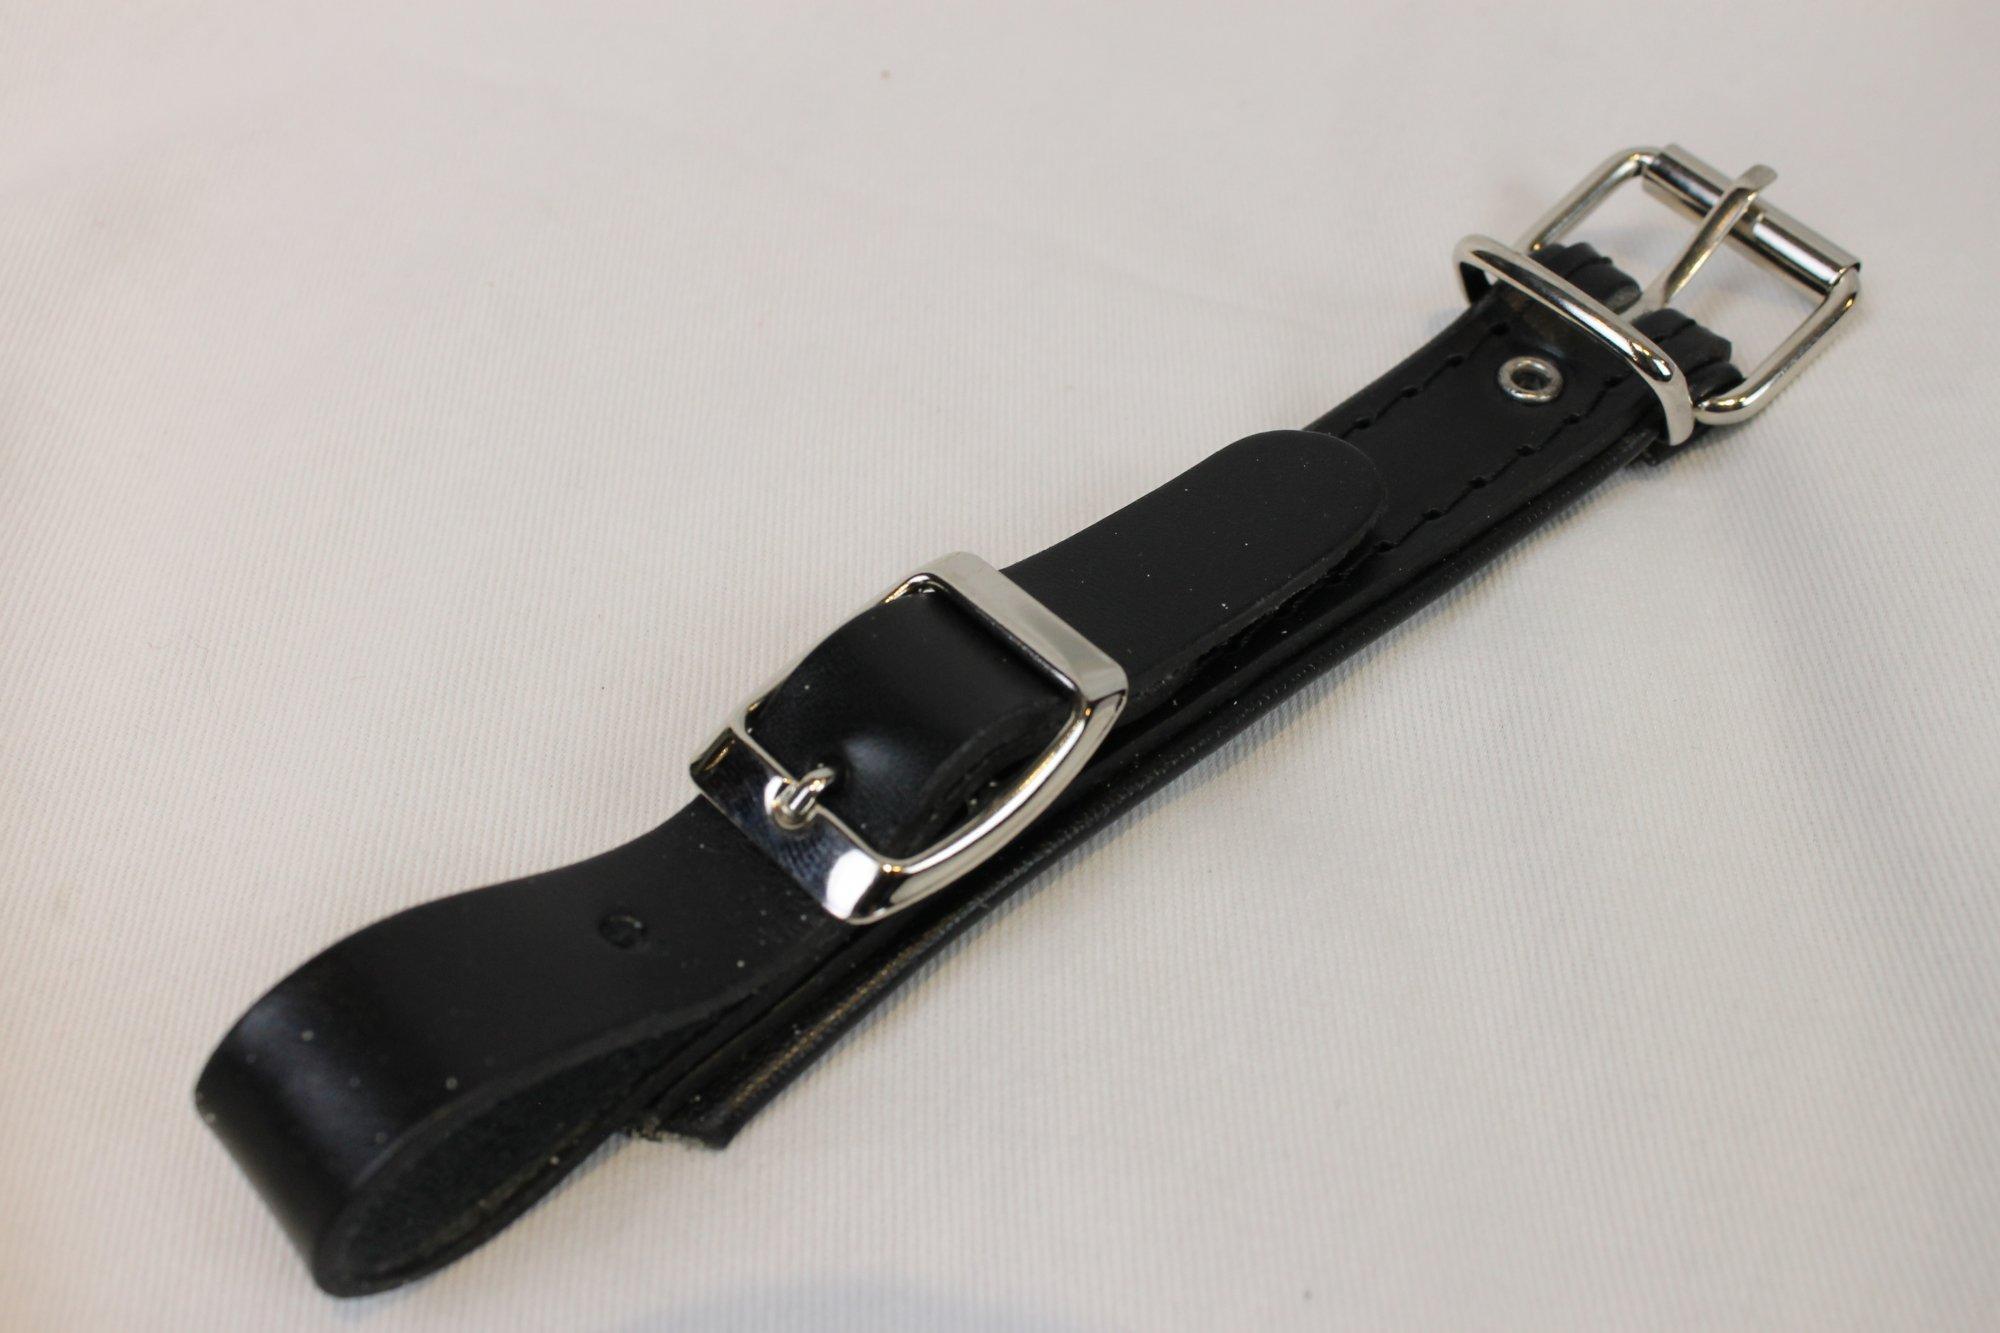 NEW Black Accordion Shoulder Strap Shortener Width (2.5cm / 1in) Length (15.75cm / 6.25in)